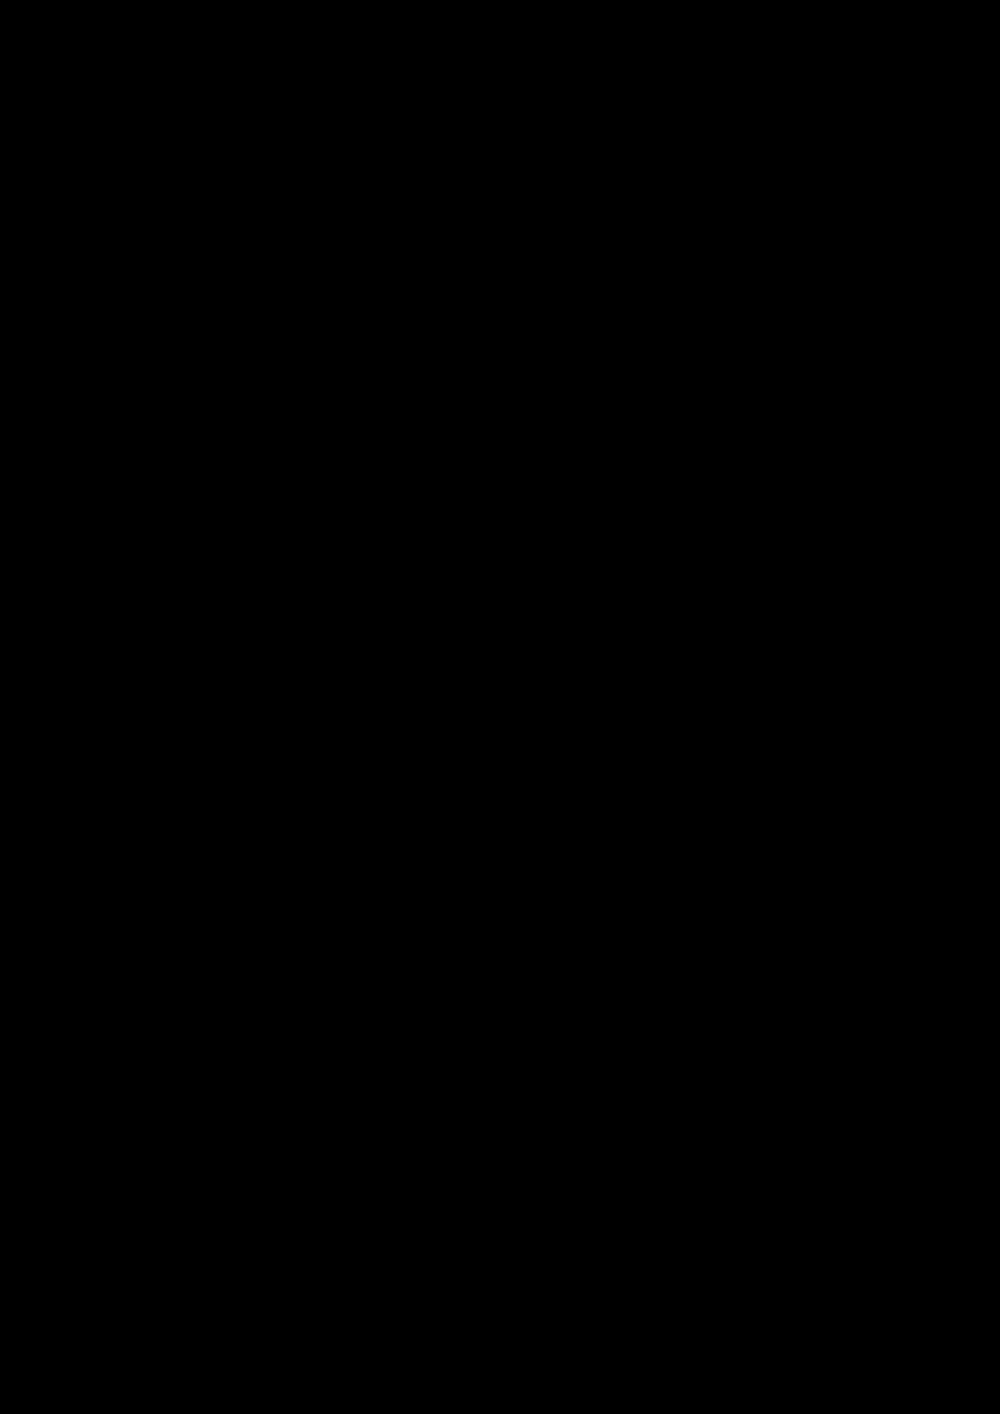 lic17-005